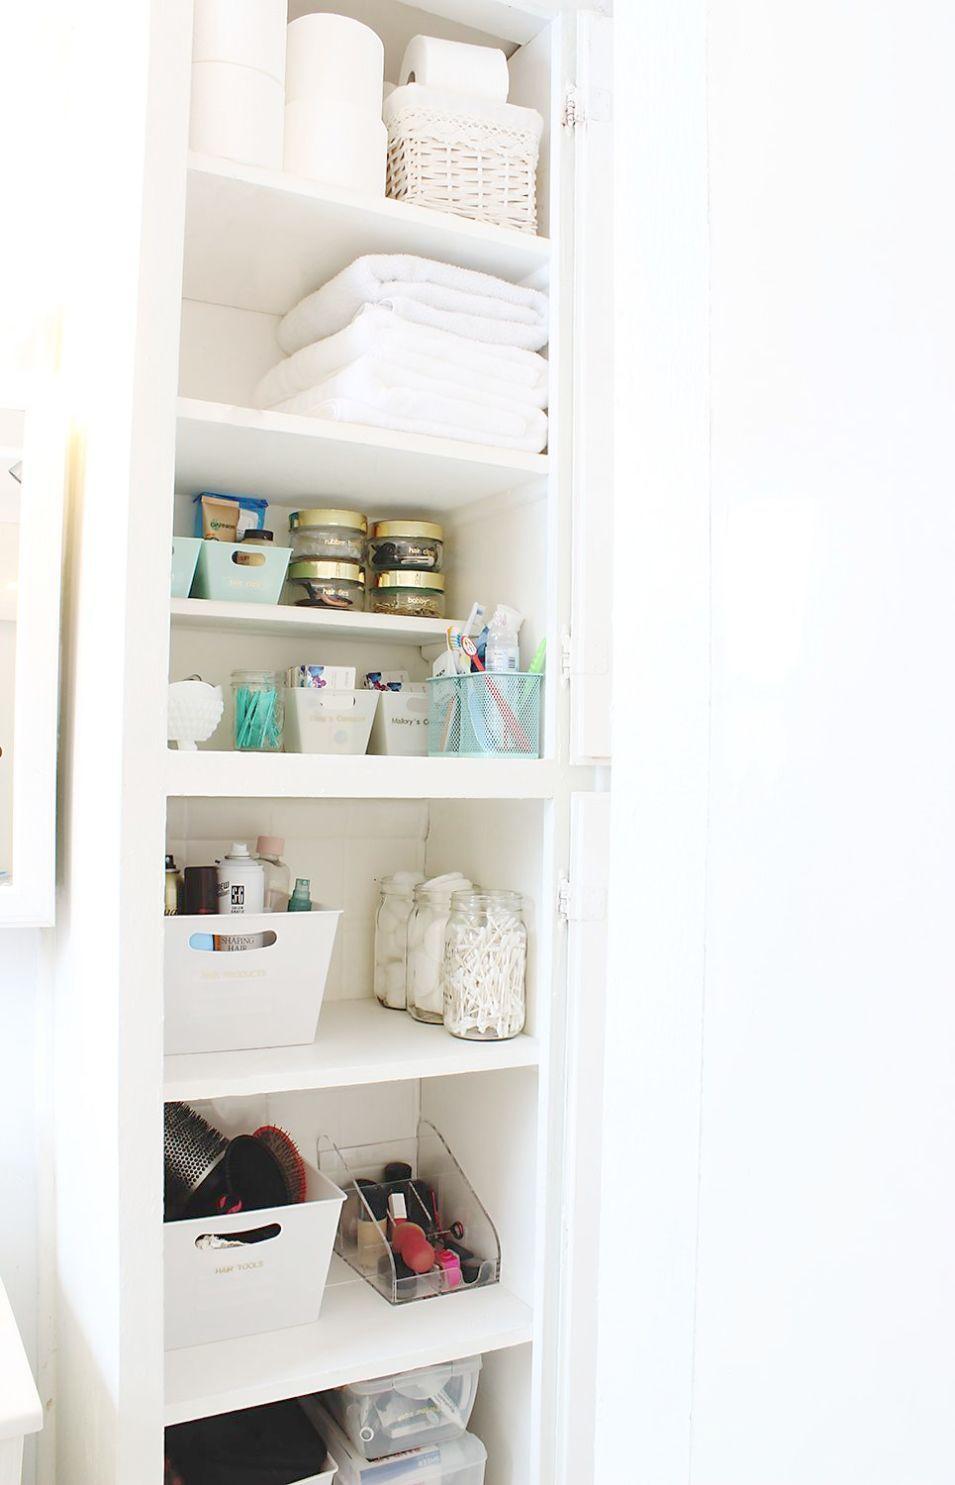 Bathroom Organization Bathroom Storage Ideas Ikea | New home ideas ...